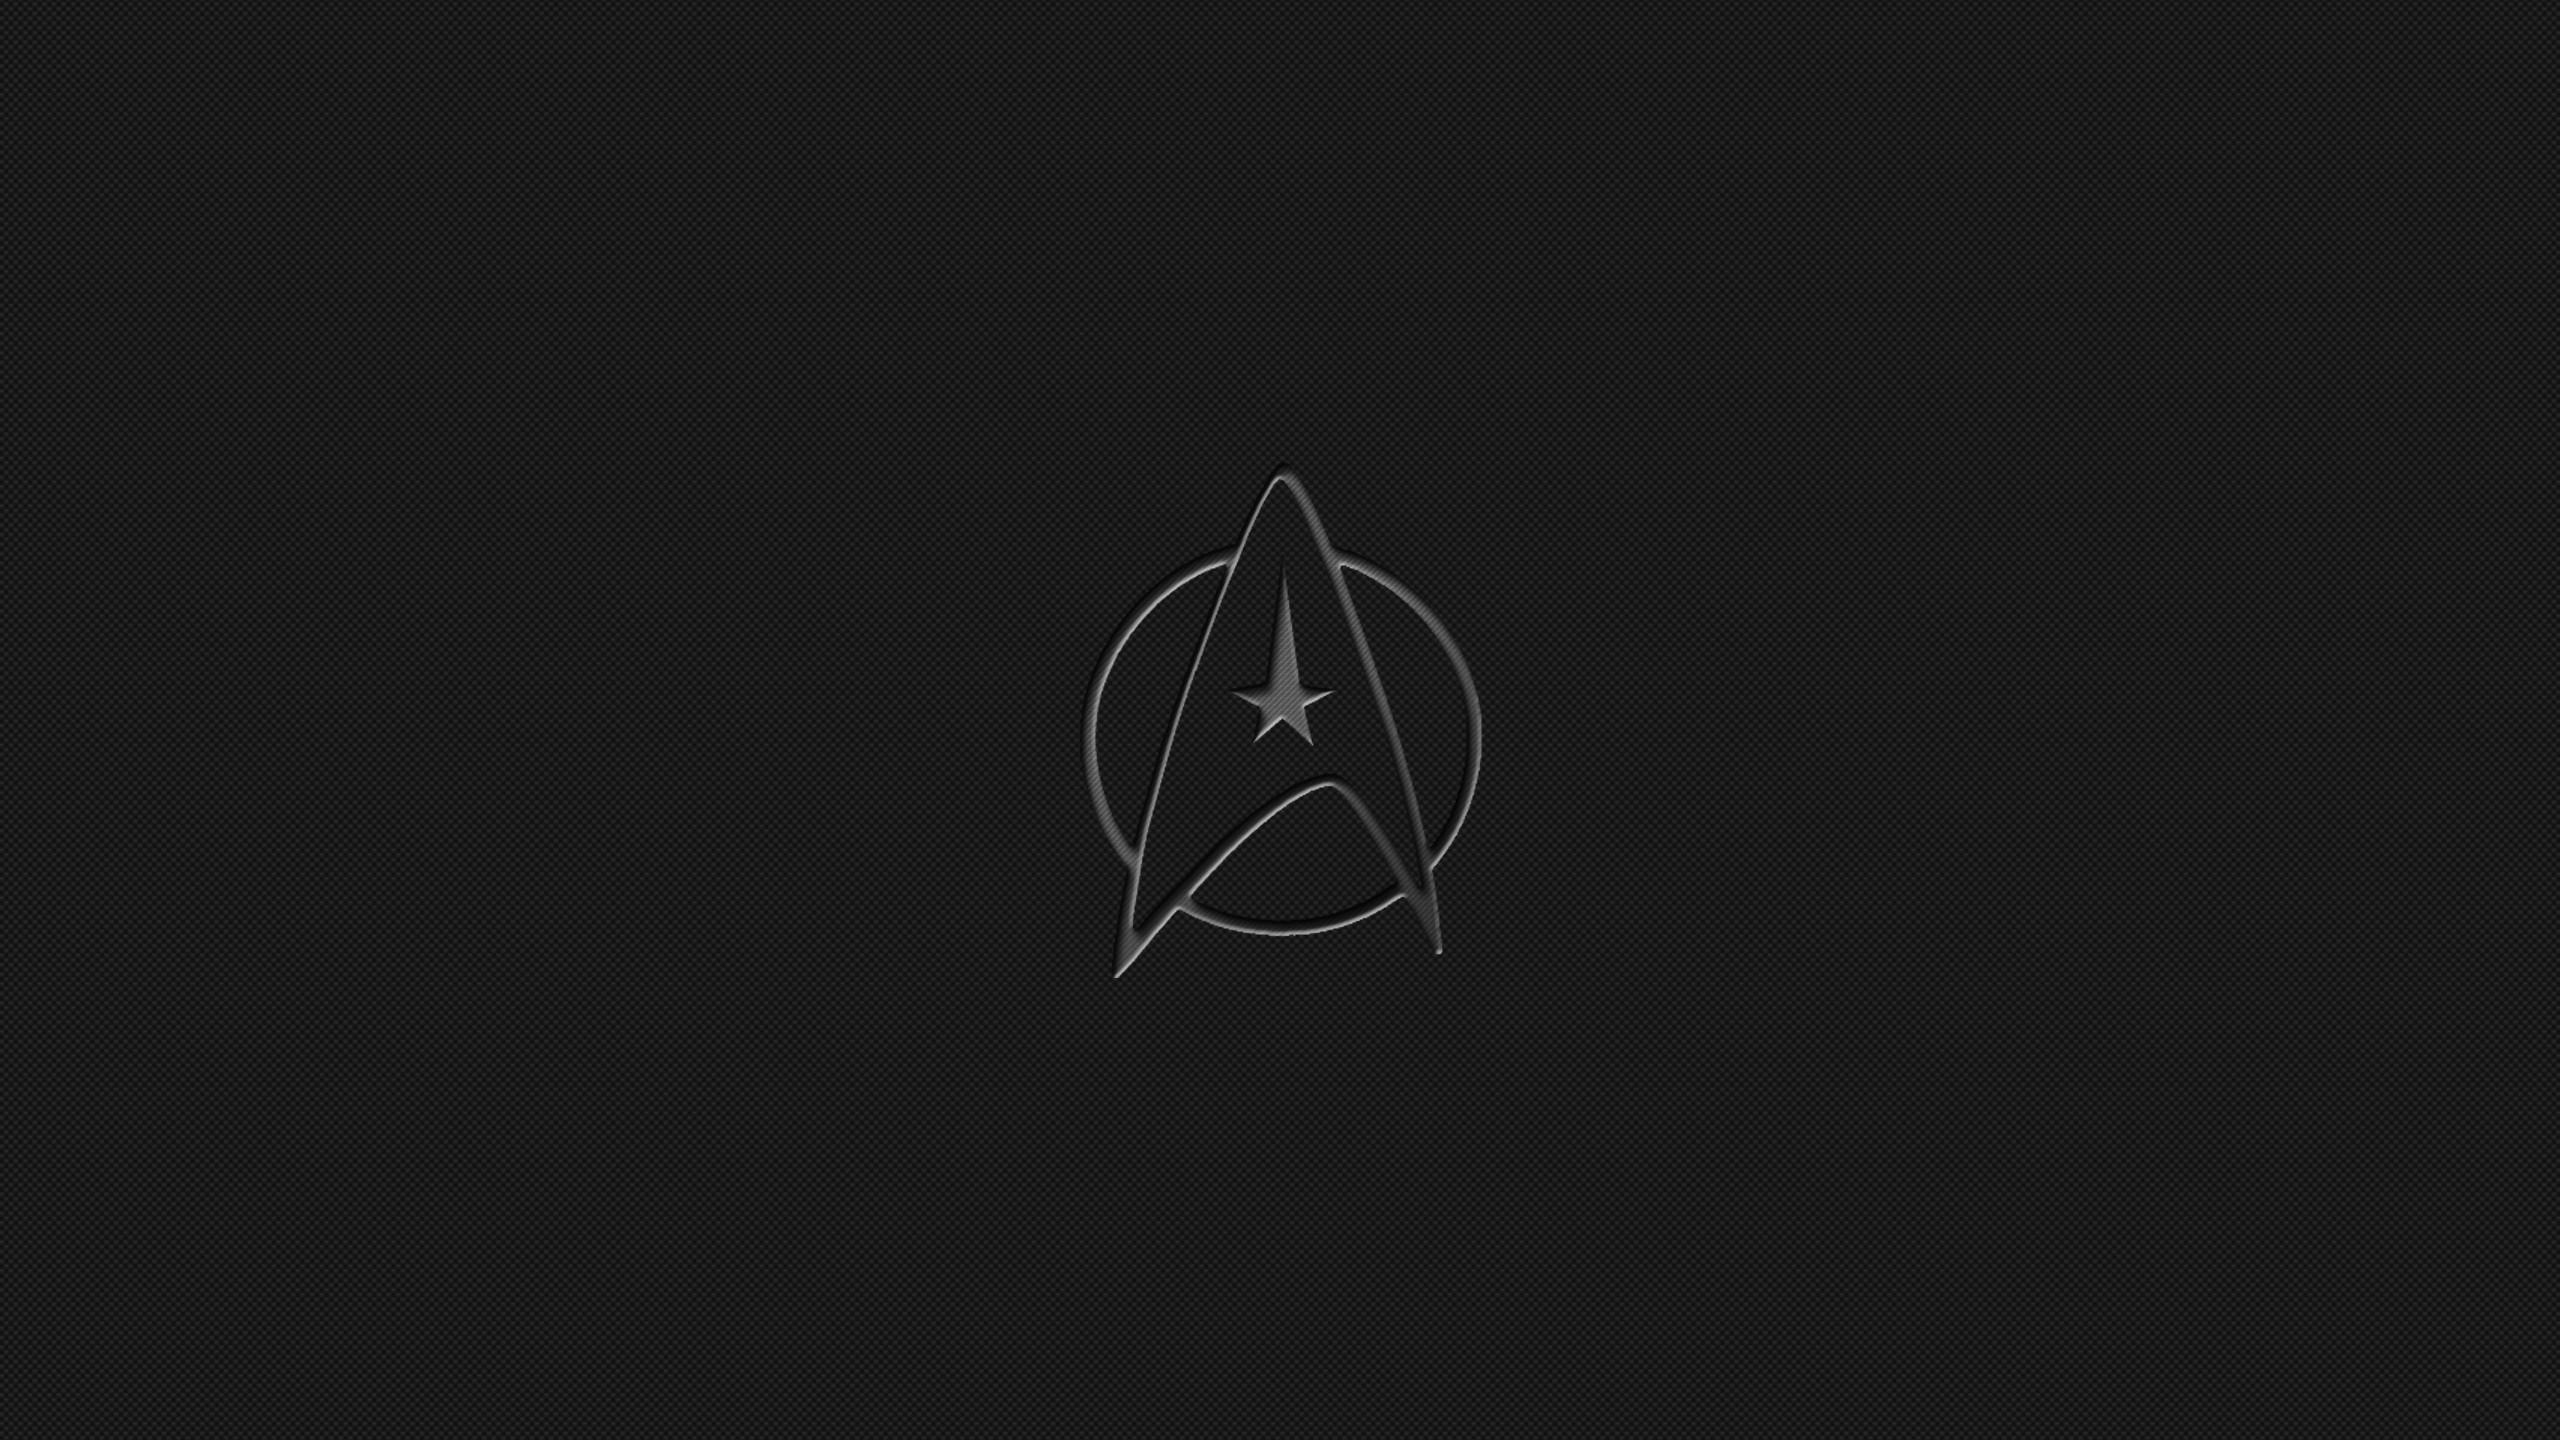 Trek Wallpaper Desktop #h6557434, 371.11 Kb